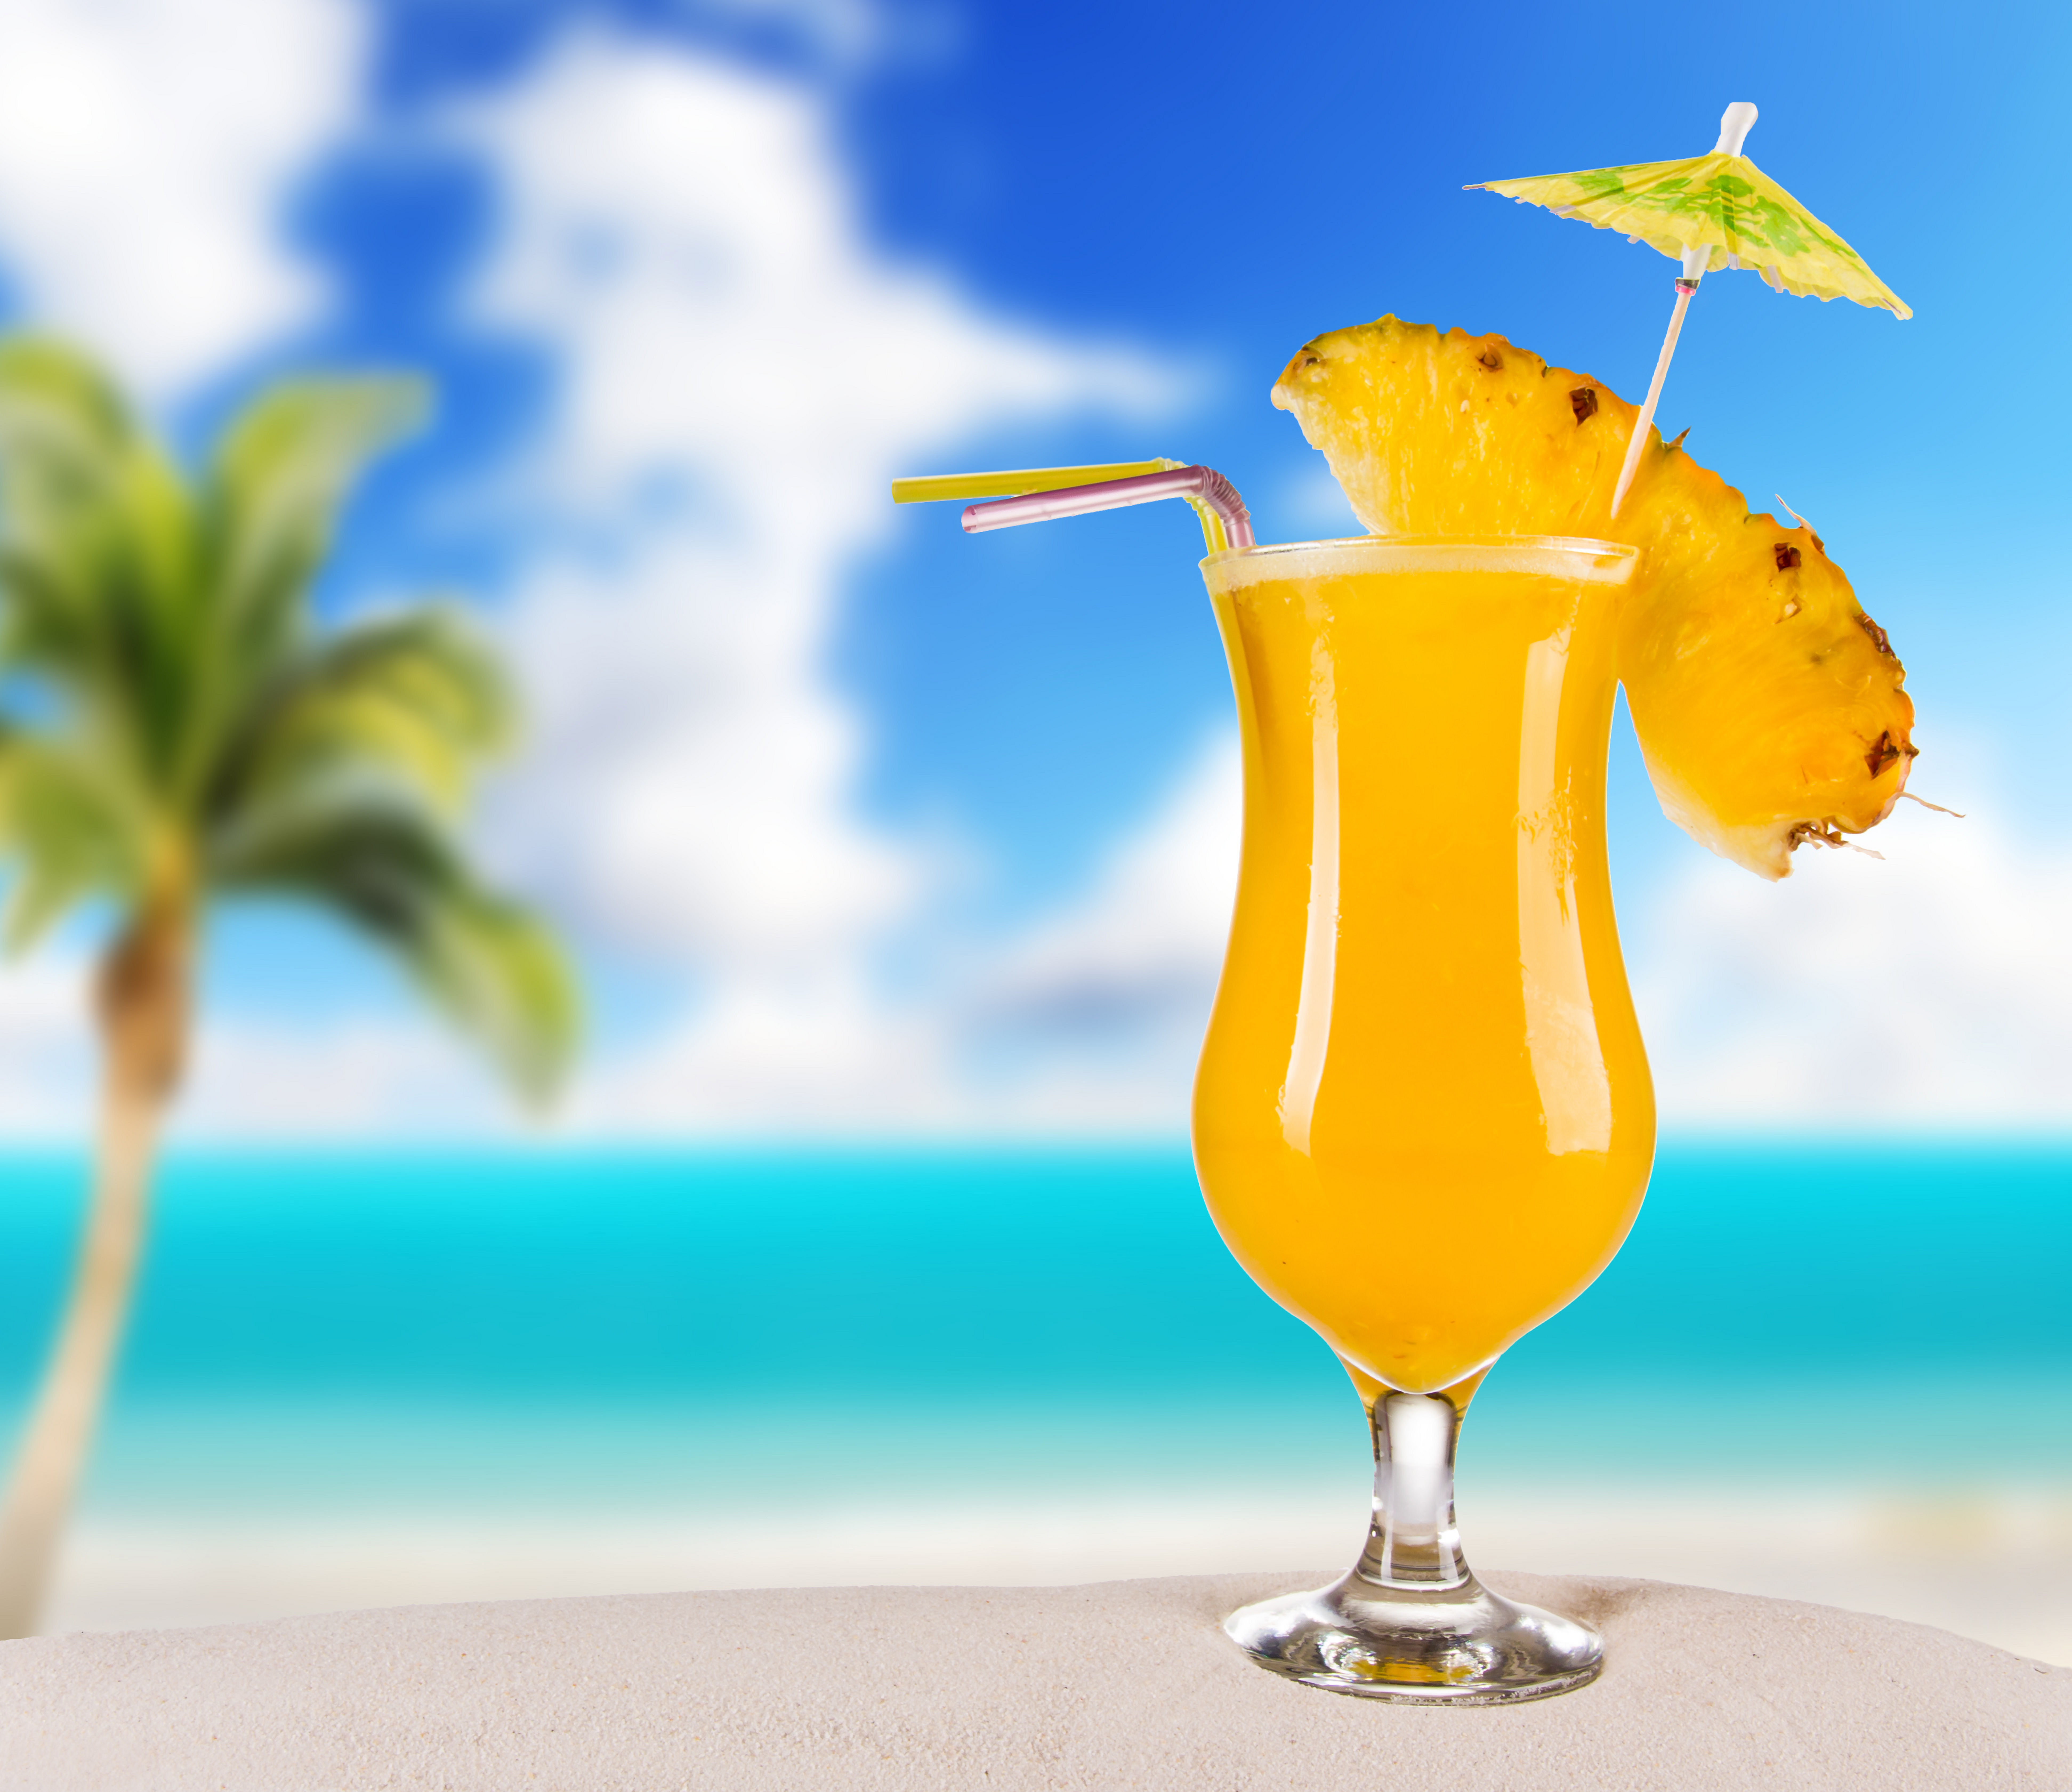 [41+] Summer Drinks Wallpaper For Desktop On WallpaperSafari